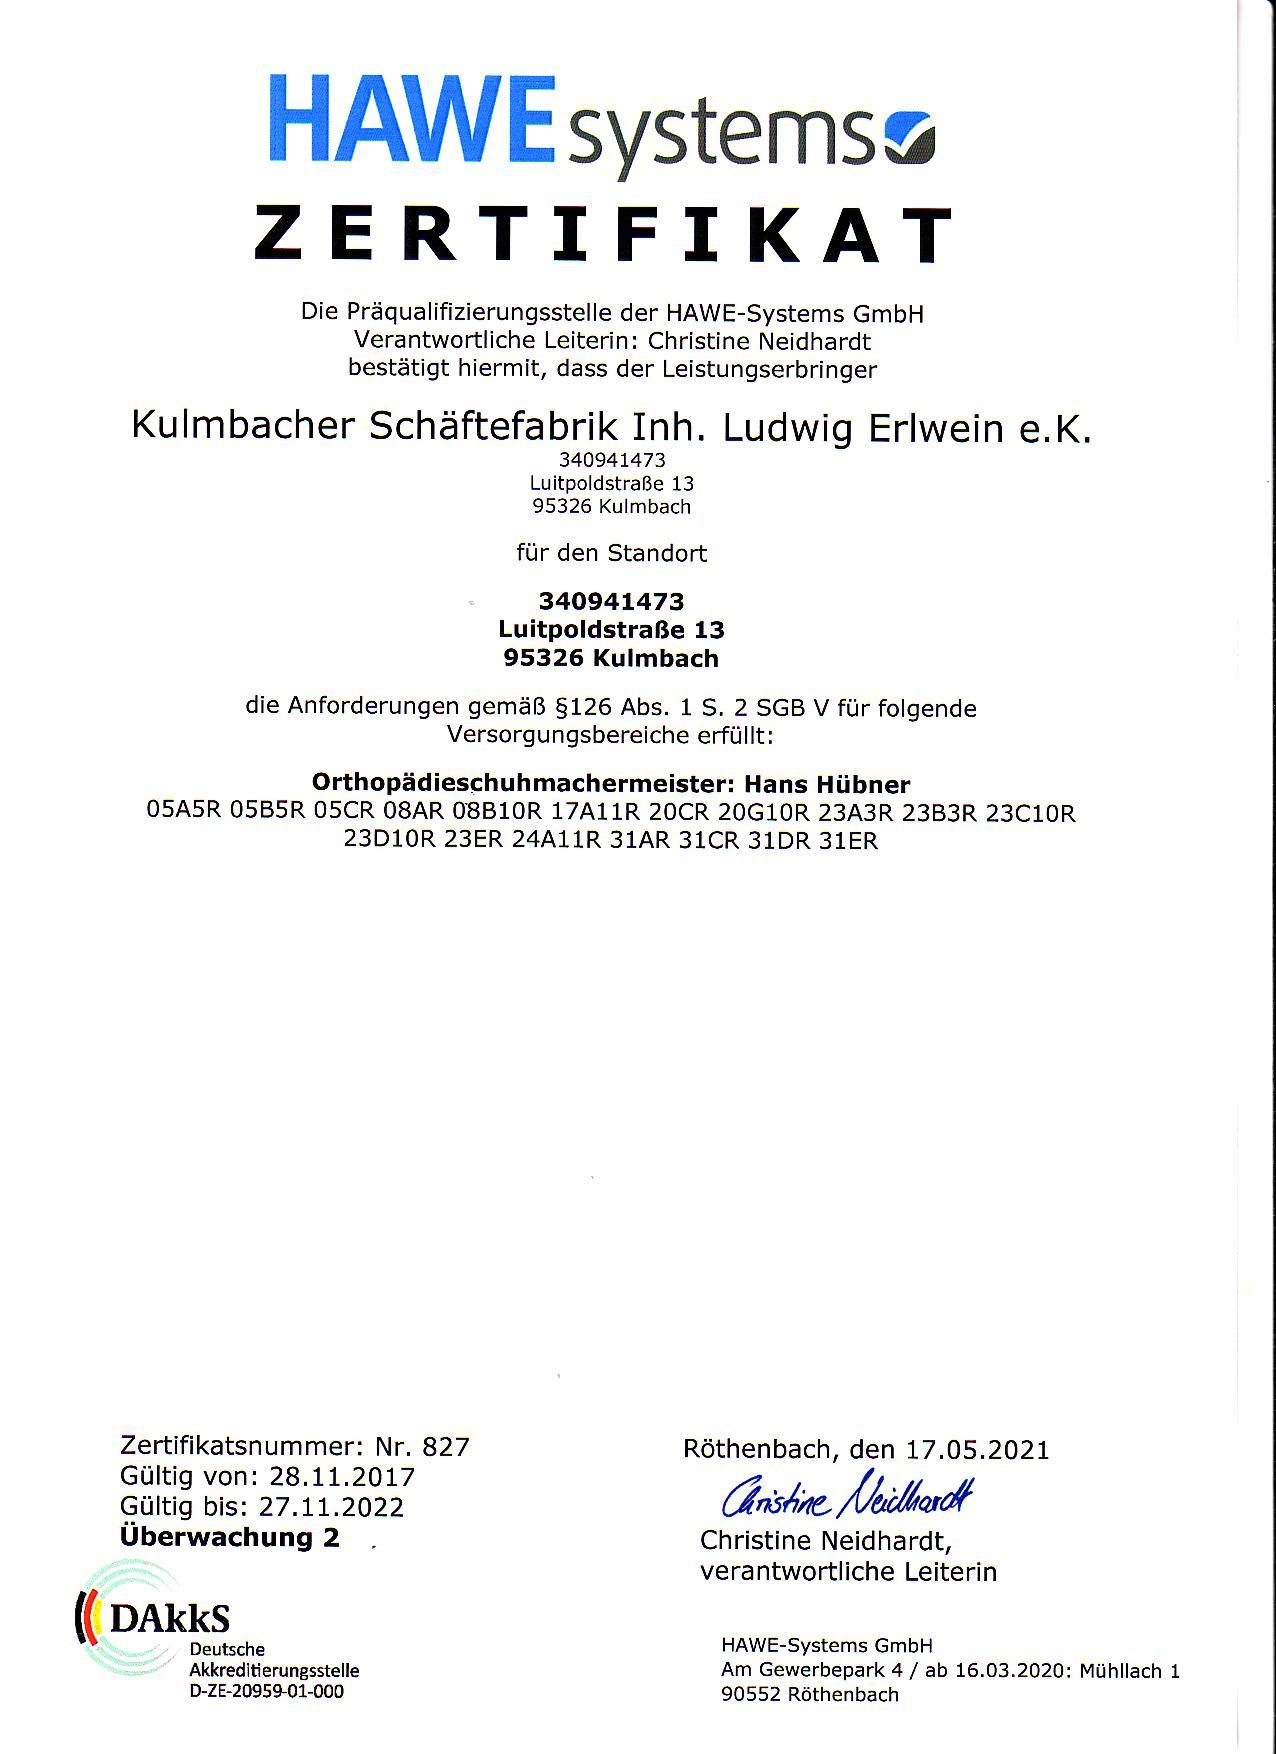 Zertifikat Präqualifizierung Kulmbacher Schäftefabrik 2021